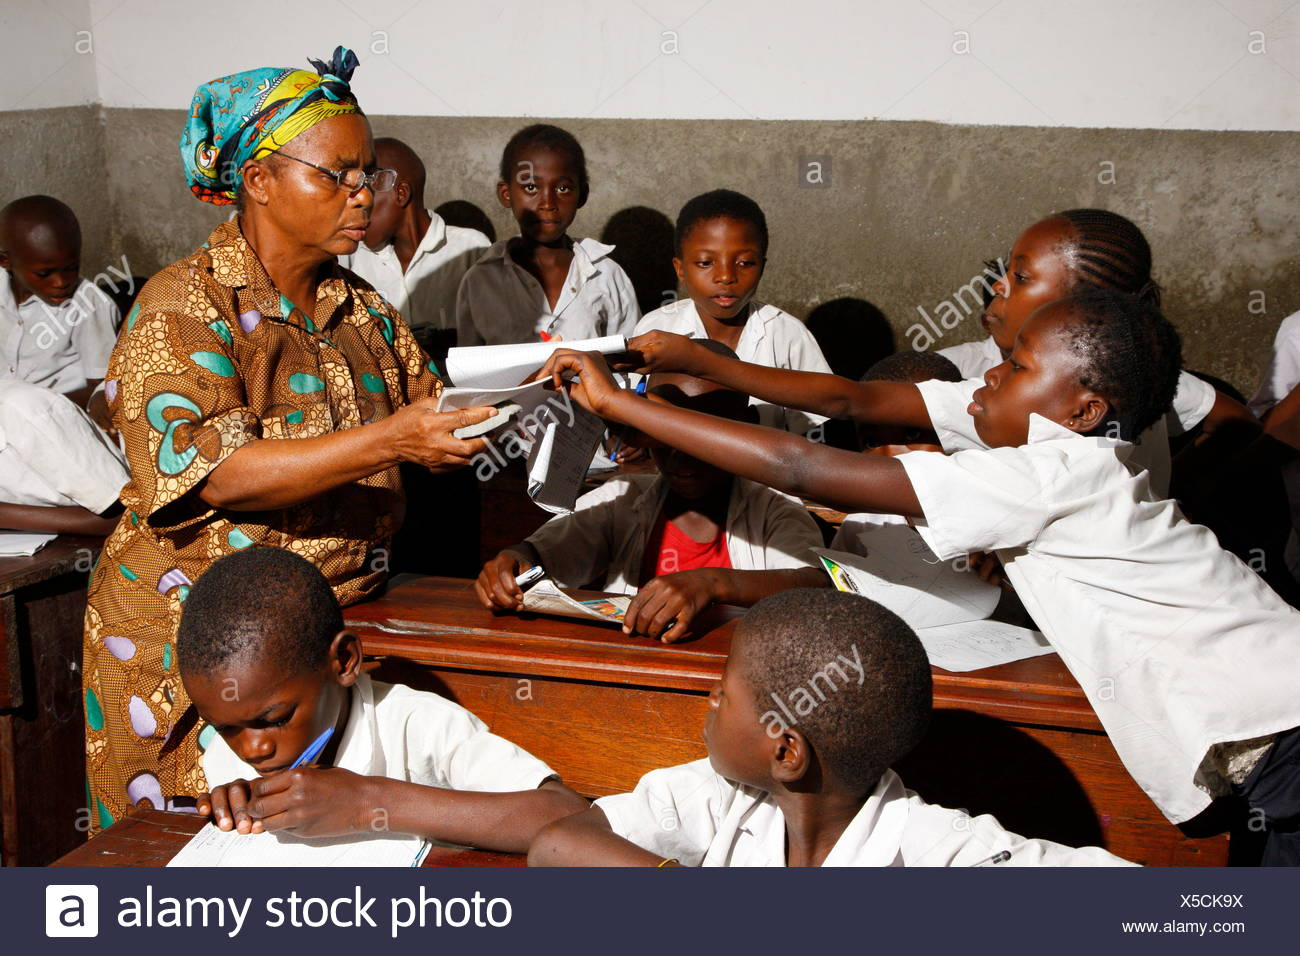 Teacher and school children in school uniform during class, Kinshasa, Congo Stock Photo